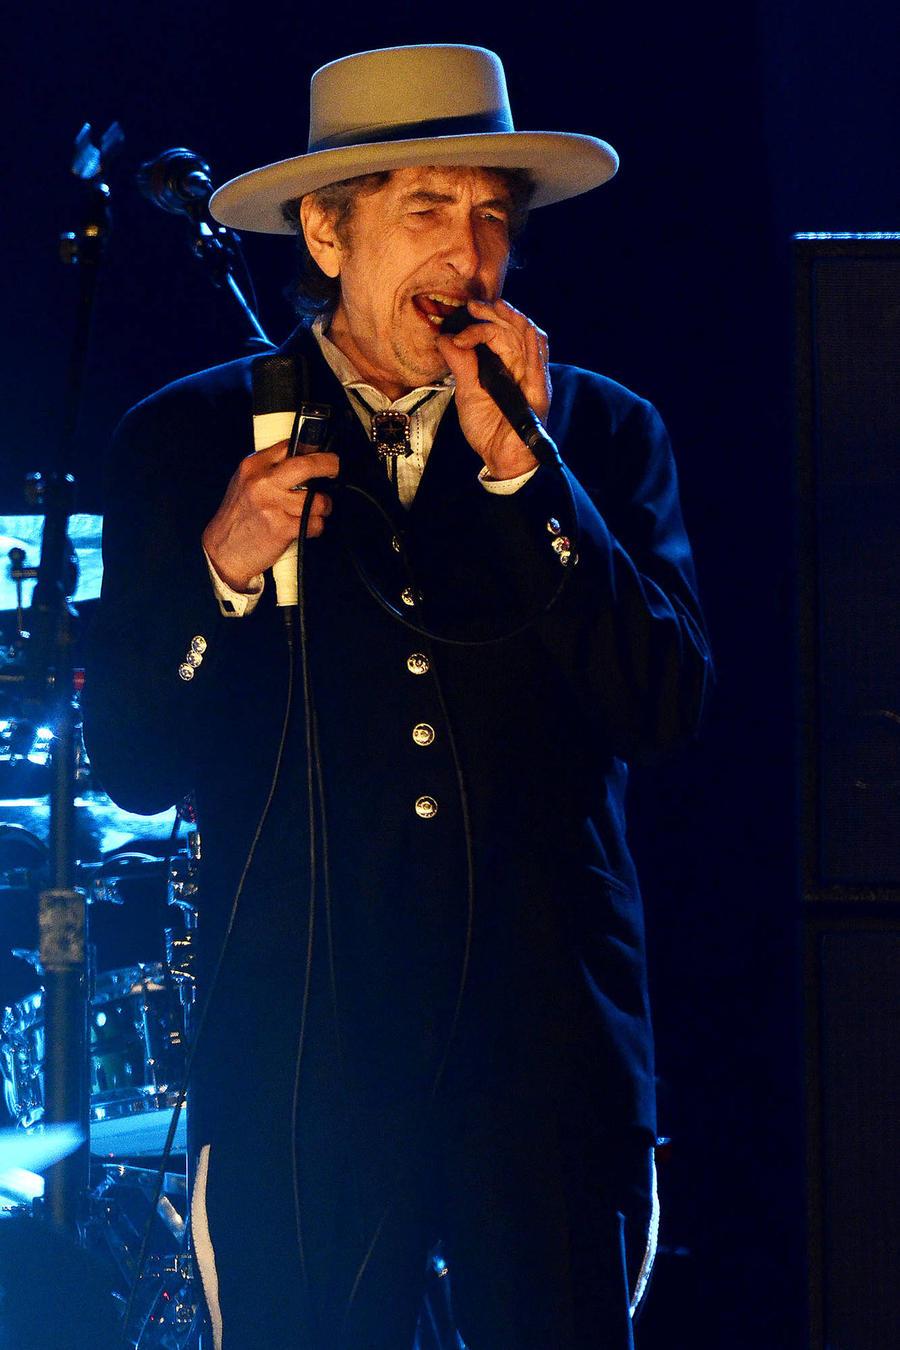 Bob Dylan Not Attending Nobel Prize Ceremony